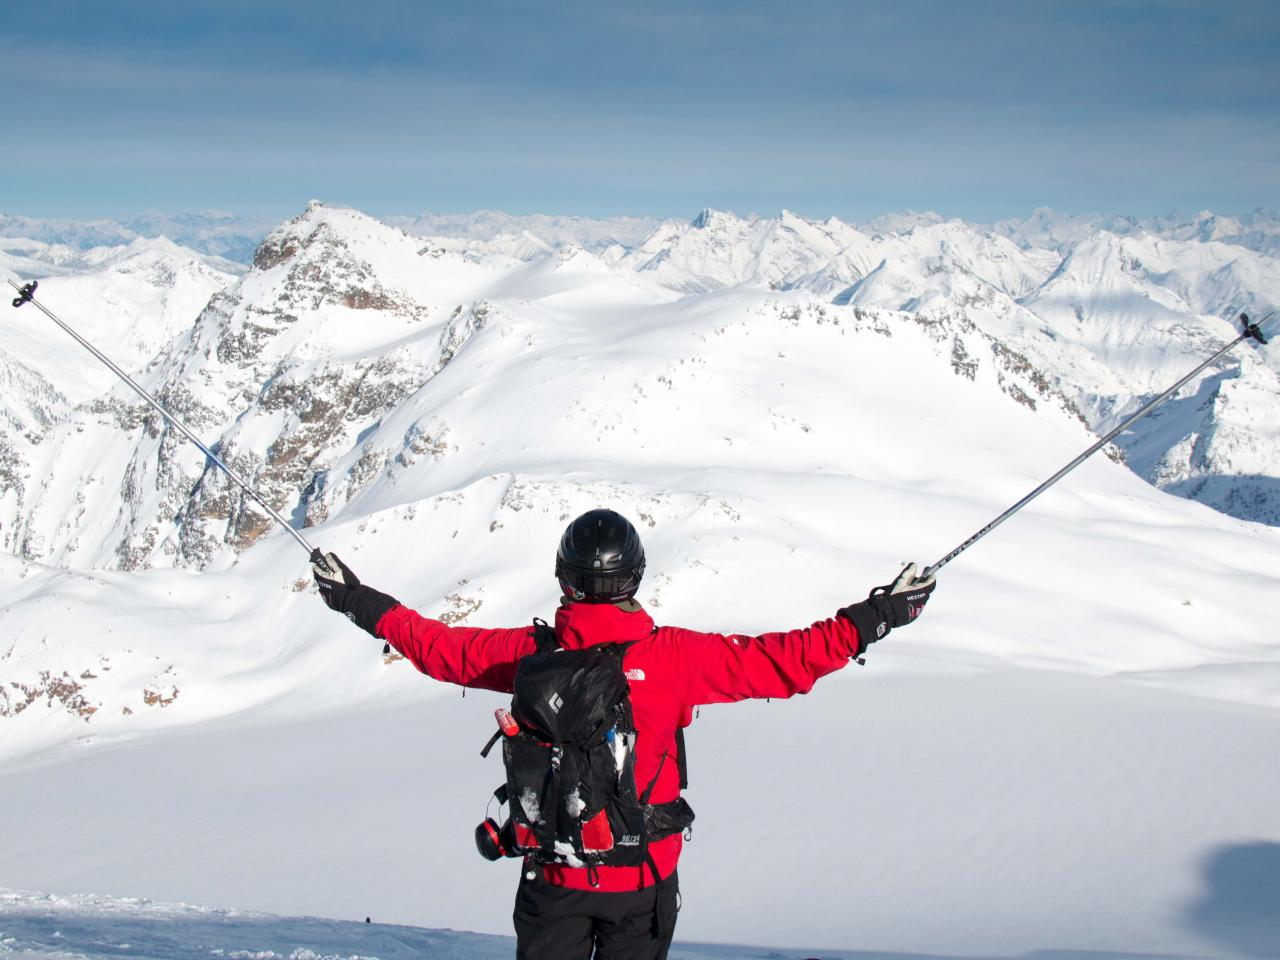 Mike Wiegele Heli Skiing Resort Heliskiing Bc Canada